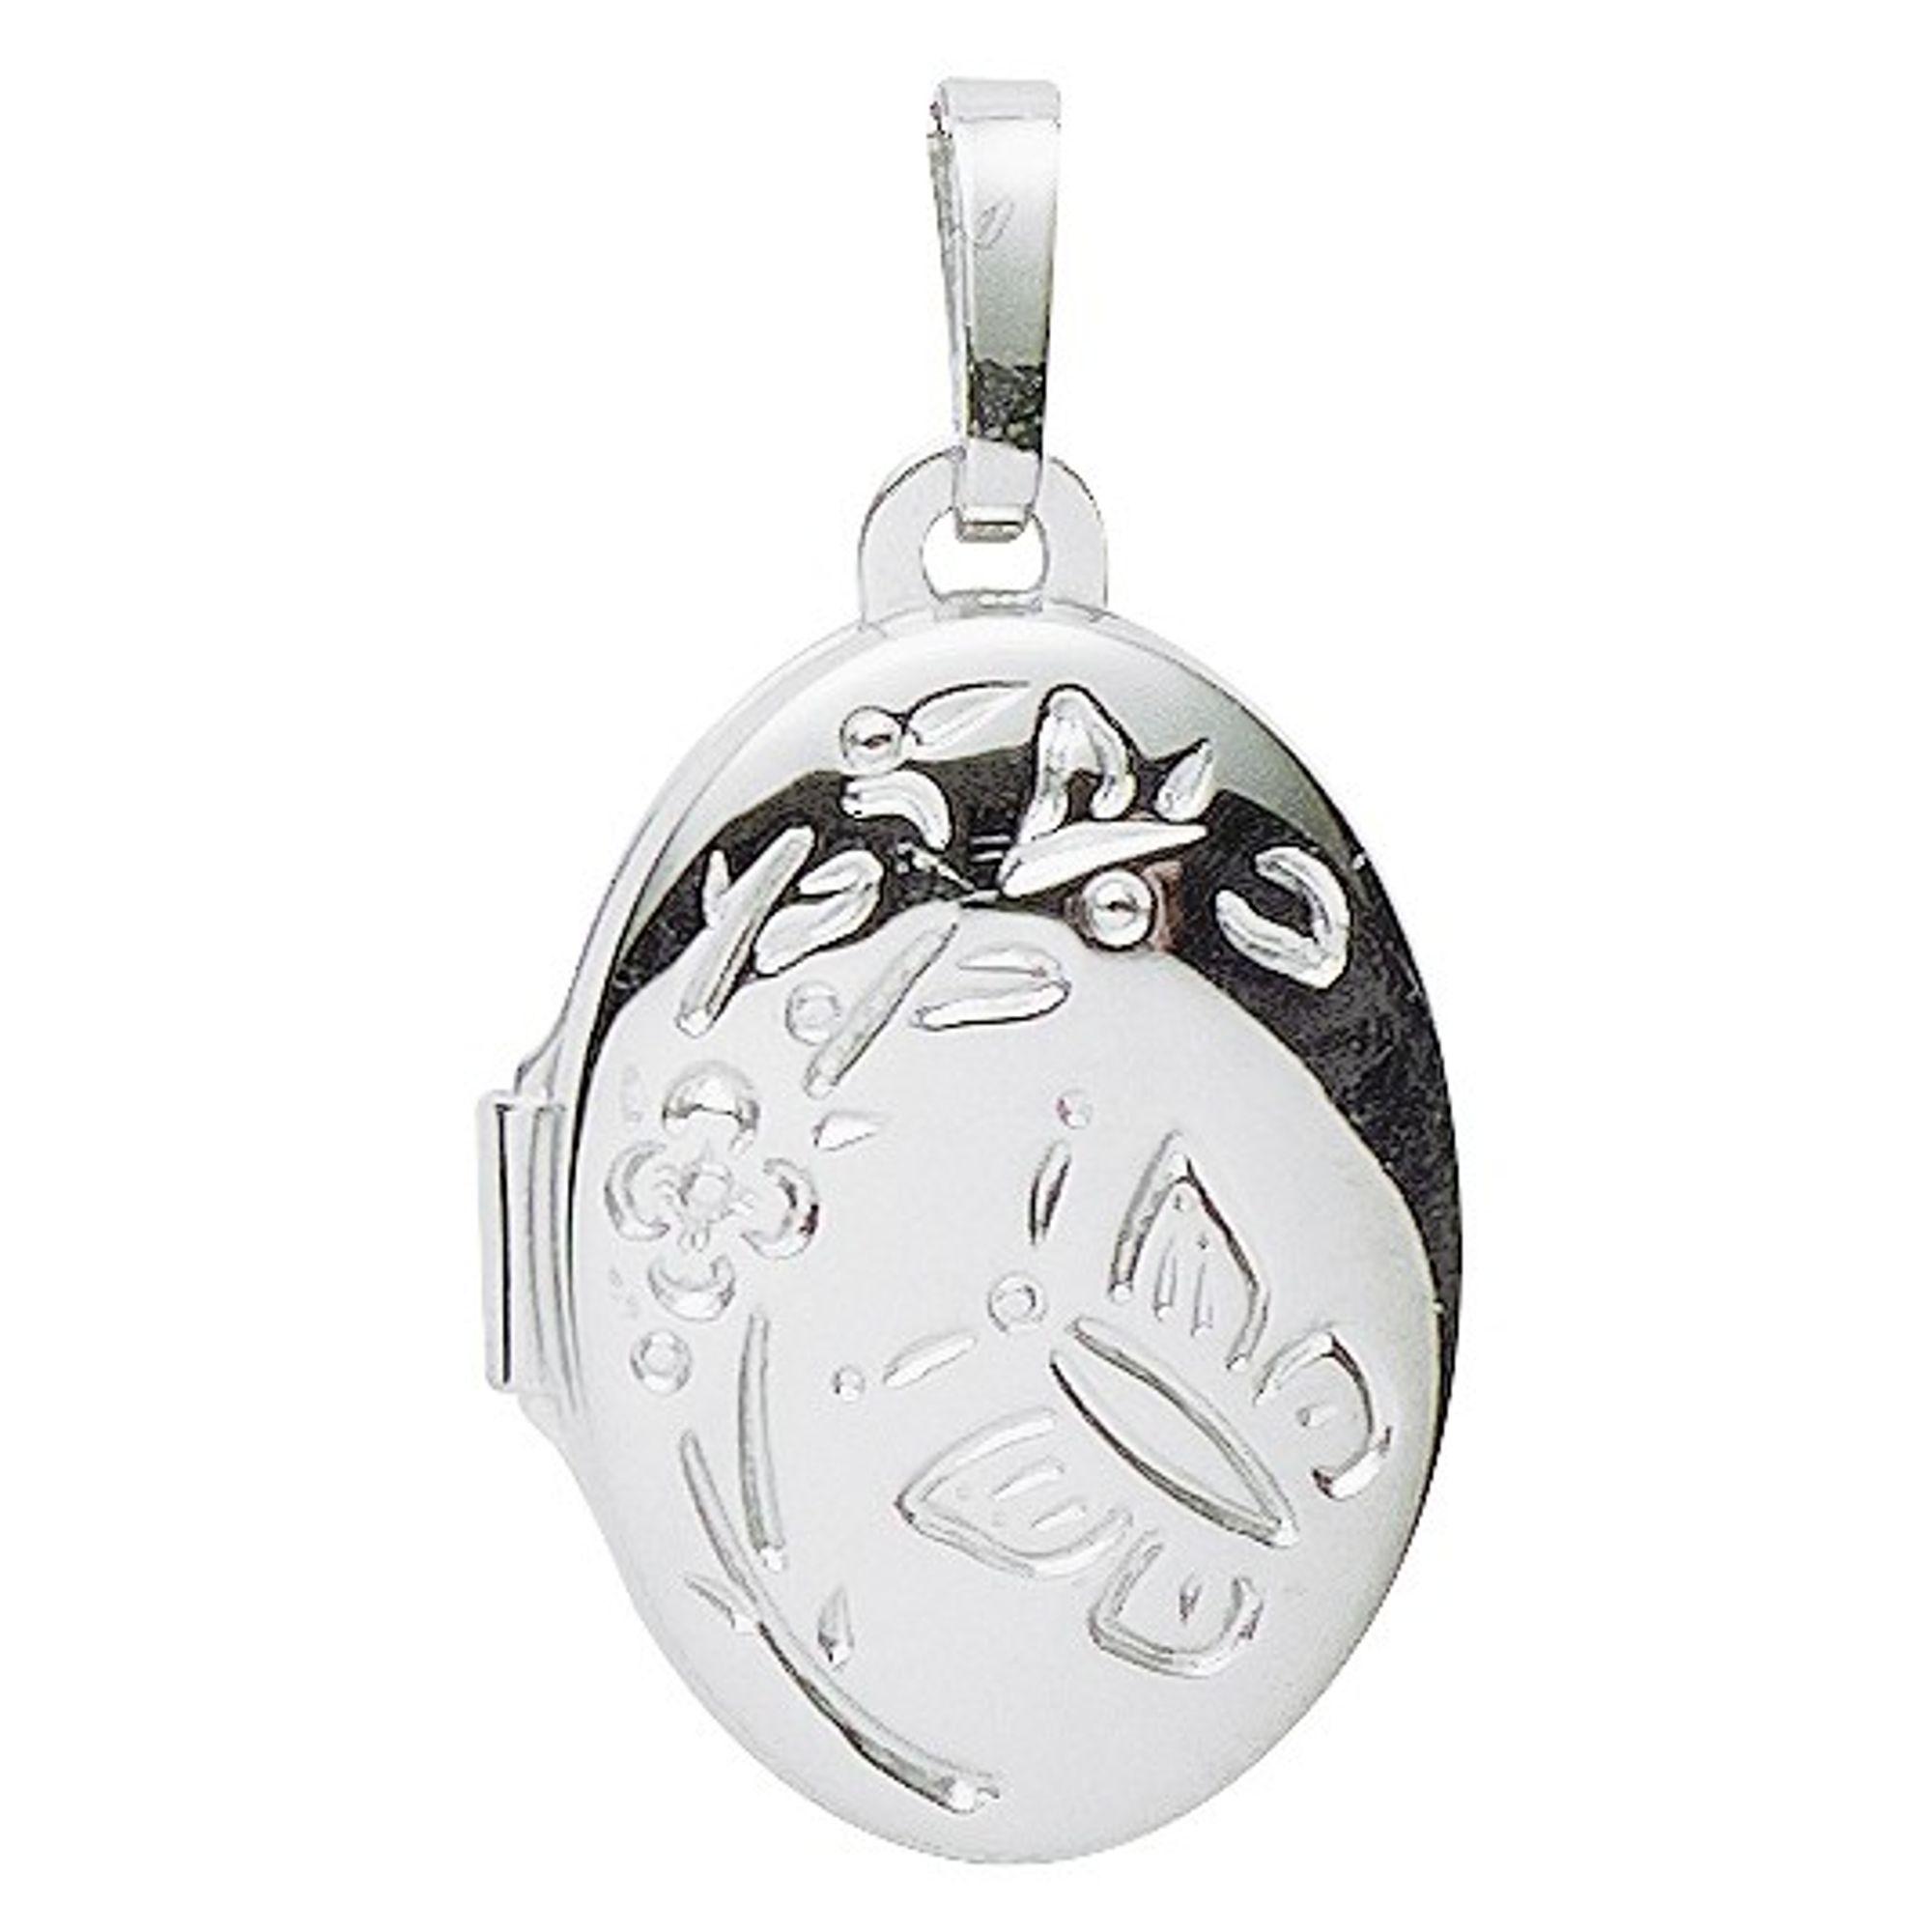 Basic Silber 26.0121 Damen Anhänger Medaillon Silber